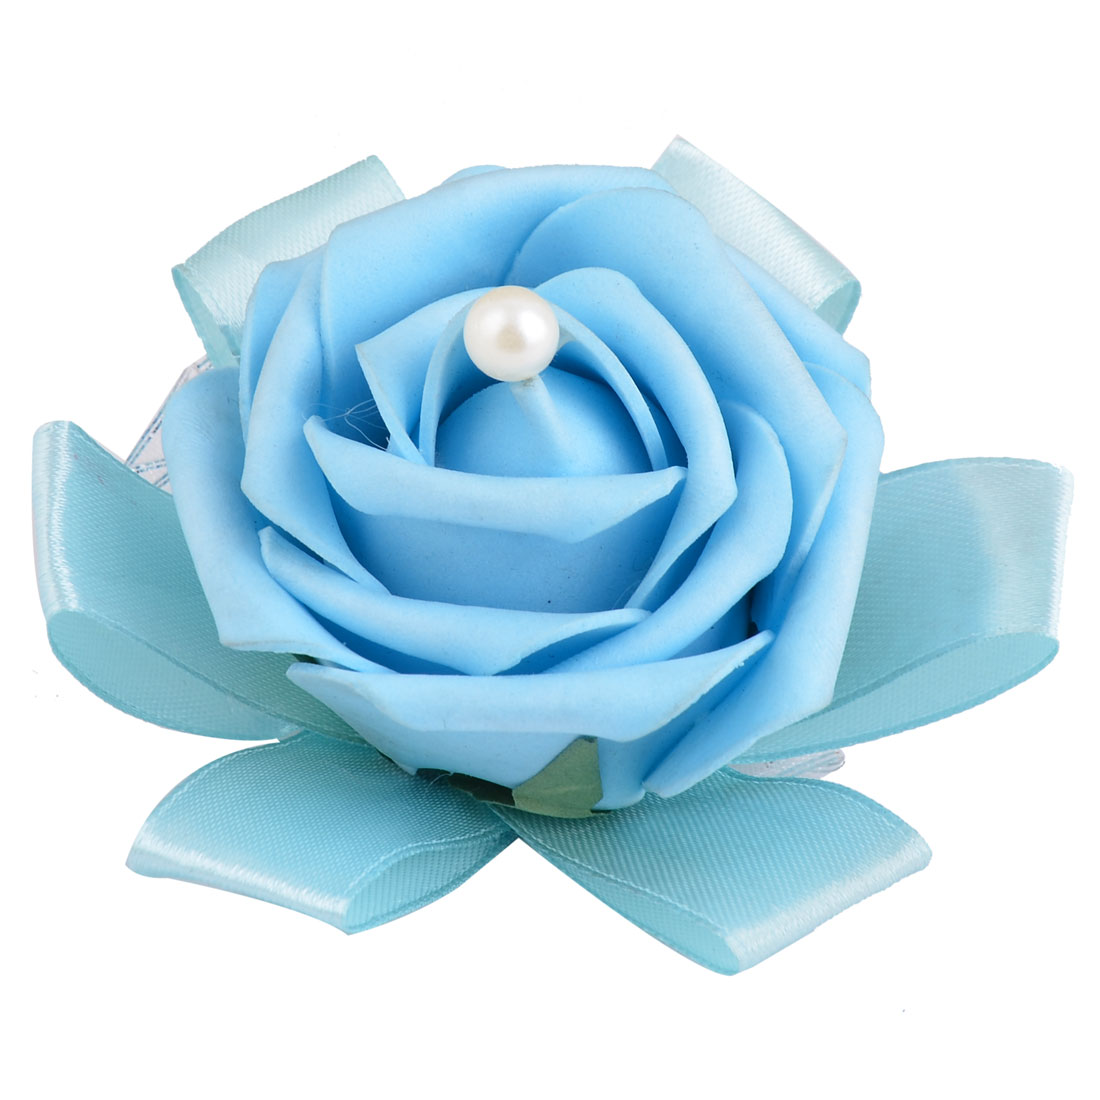 Wedding Foam Rose Design Bridesmaid Hand Decorative Artificial Wrist Flower Sky Blue